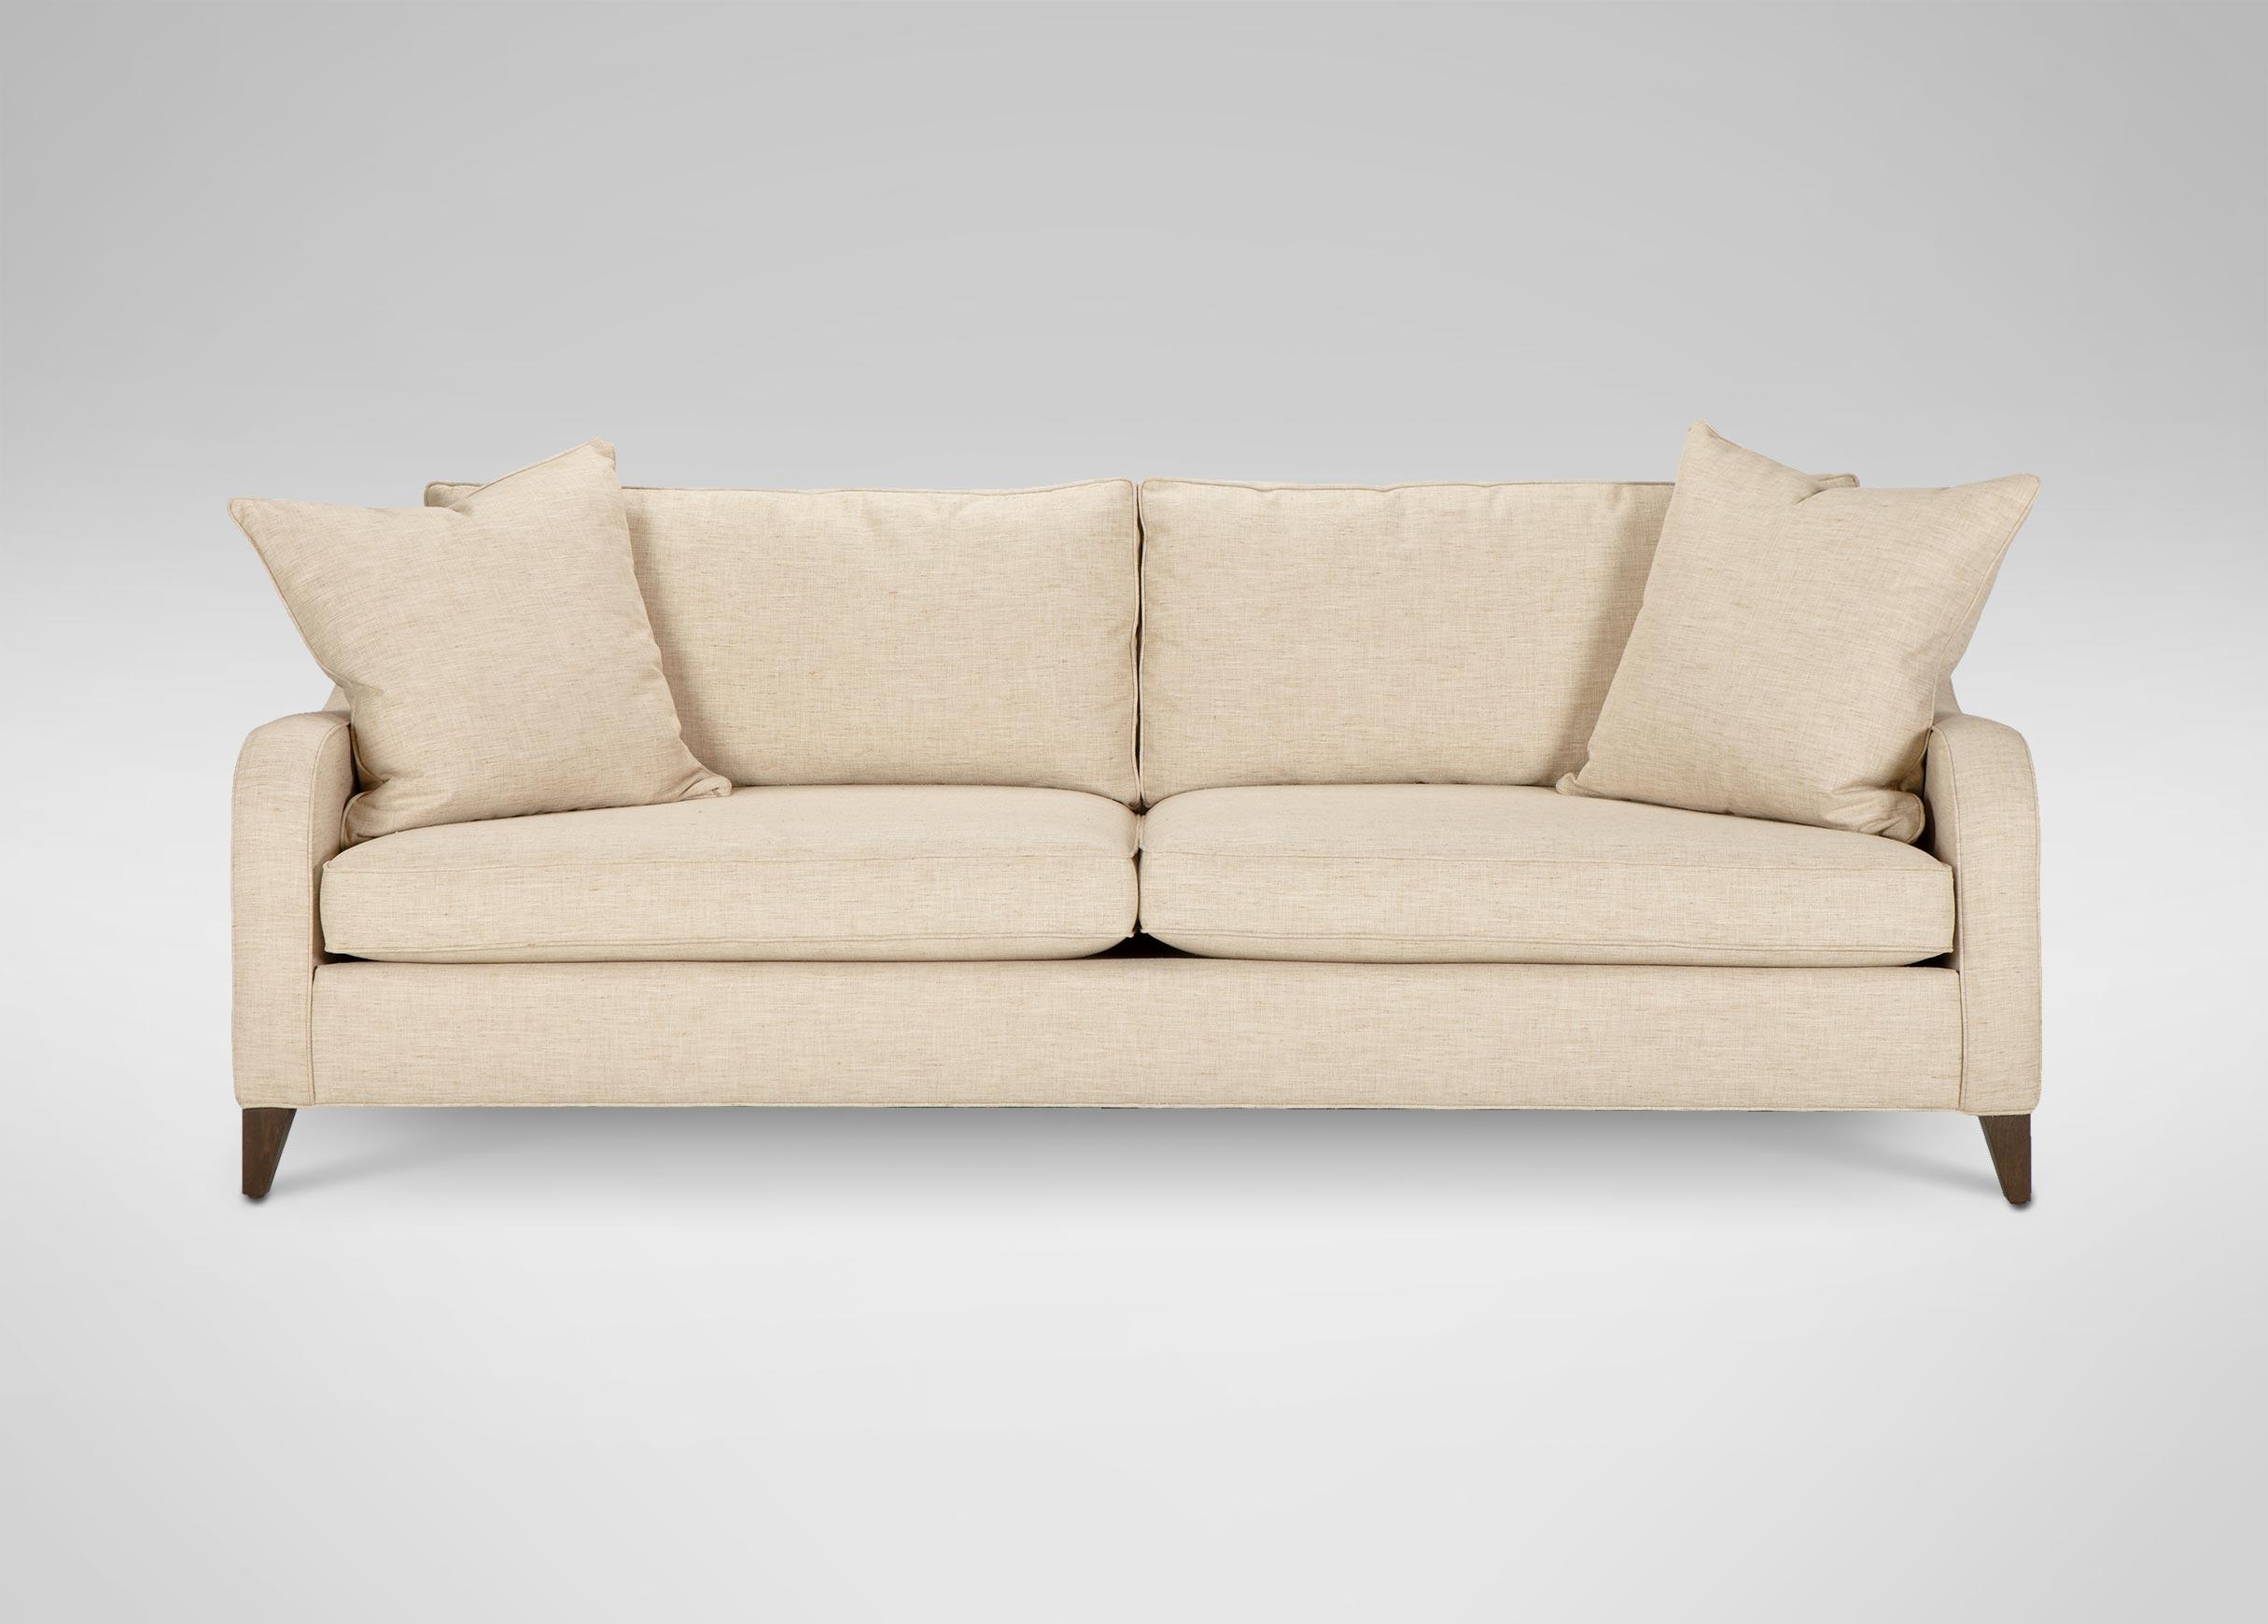 ethan allen slipcover sofa reviews 3 cushion bed hudson